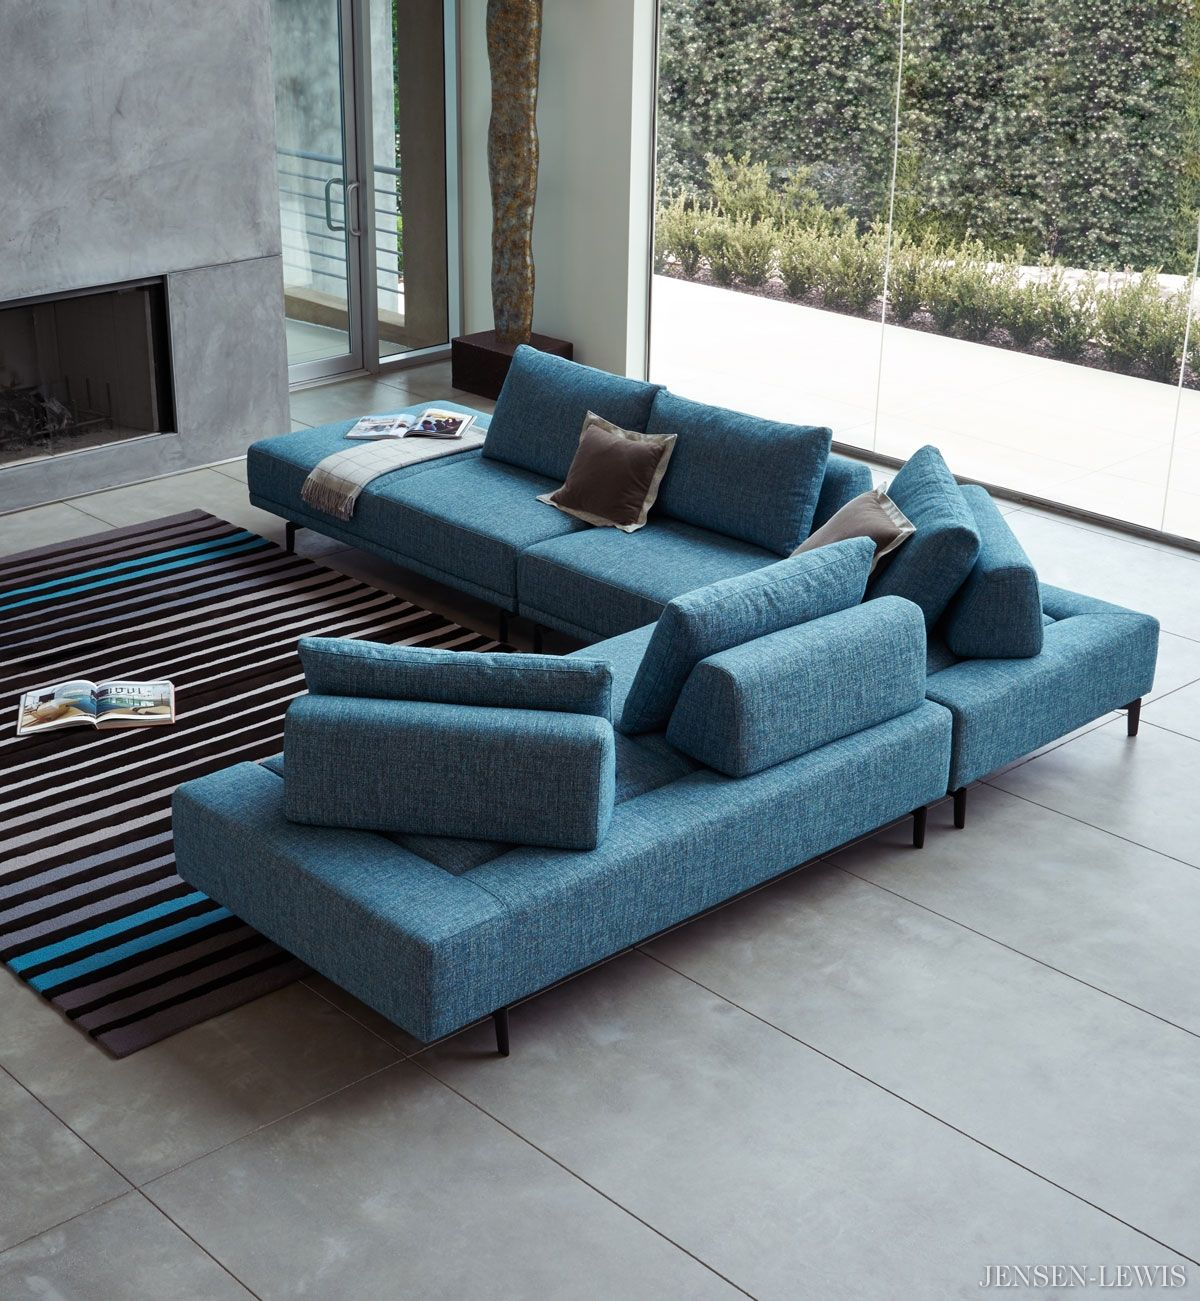 DellaRobbia Felix Modular Sectional Sofa In 2019